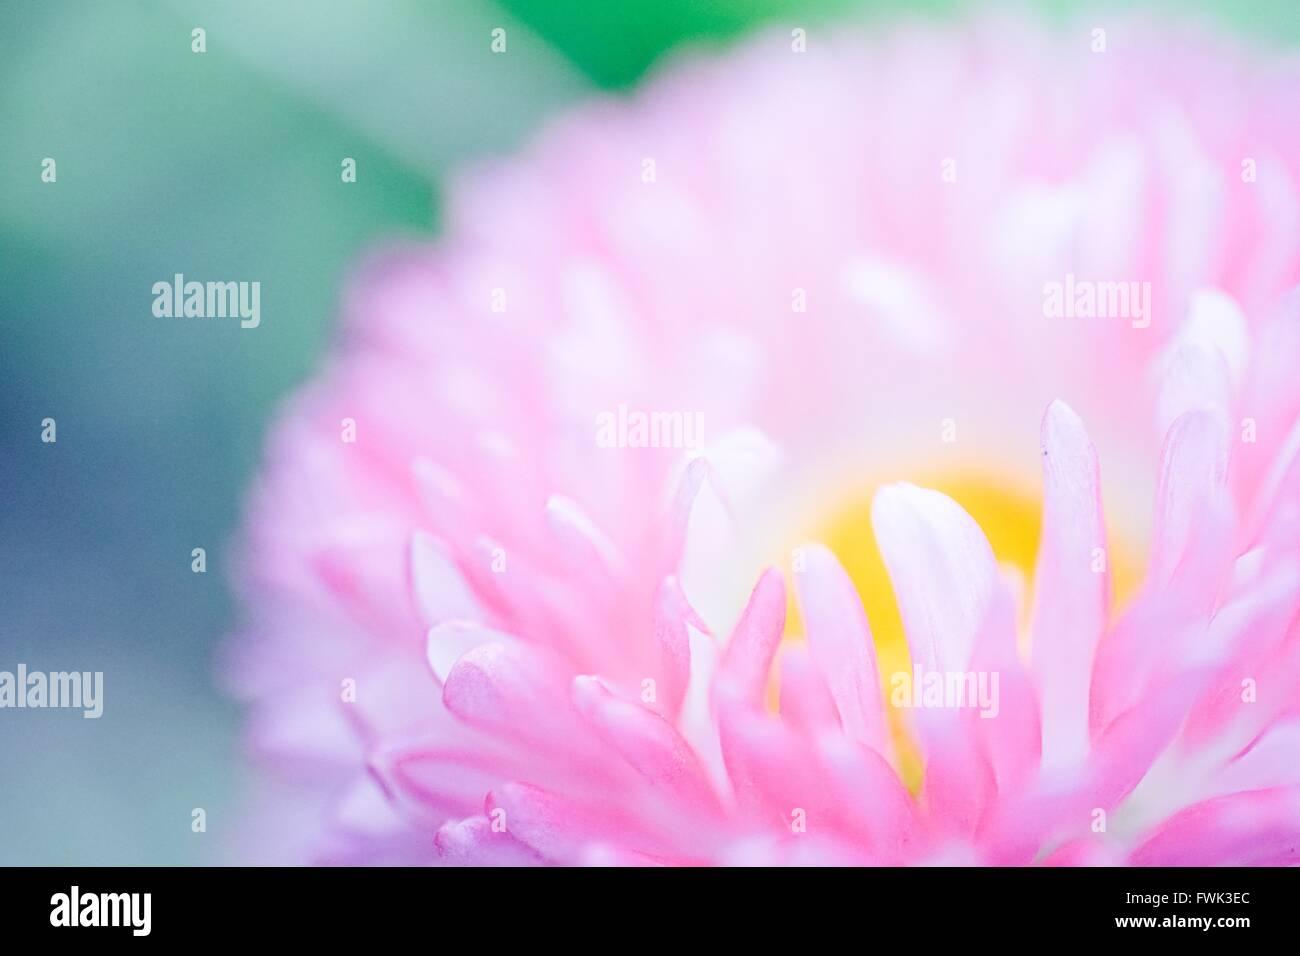 Detail Shot Of Flower Against Blurred Background - Stock Image